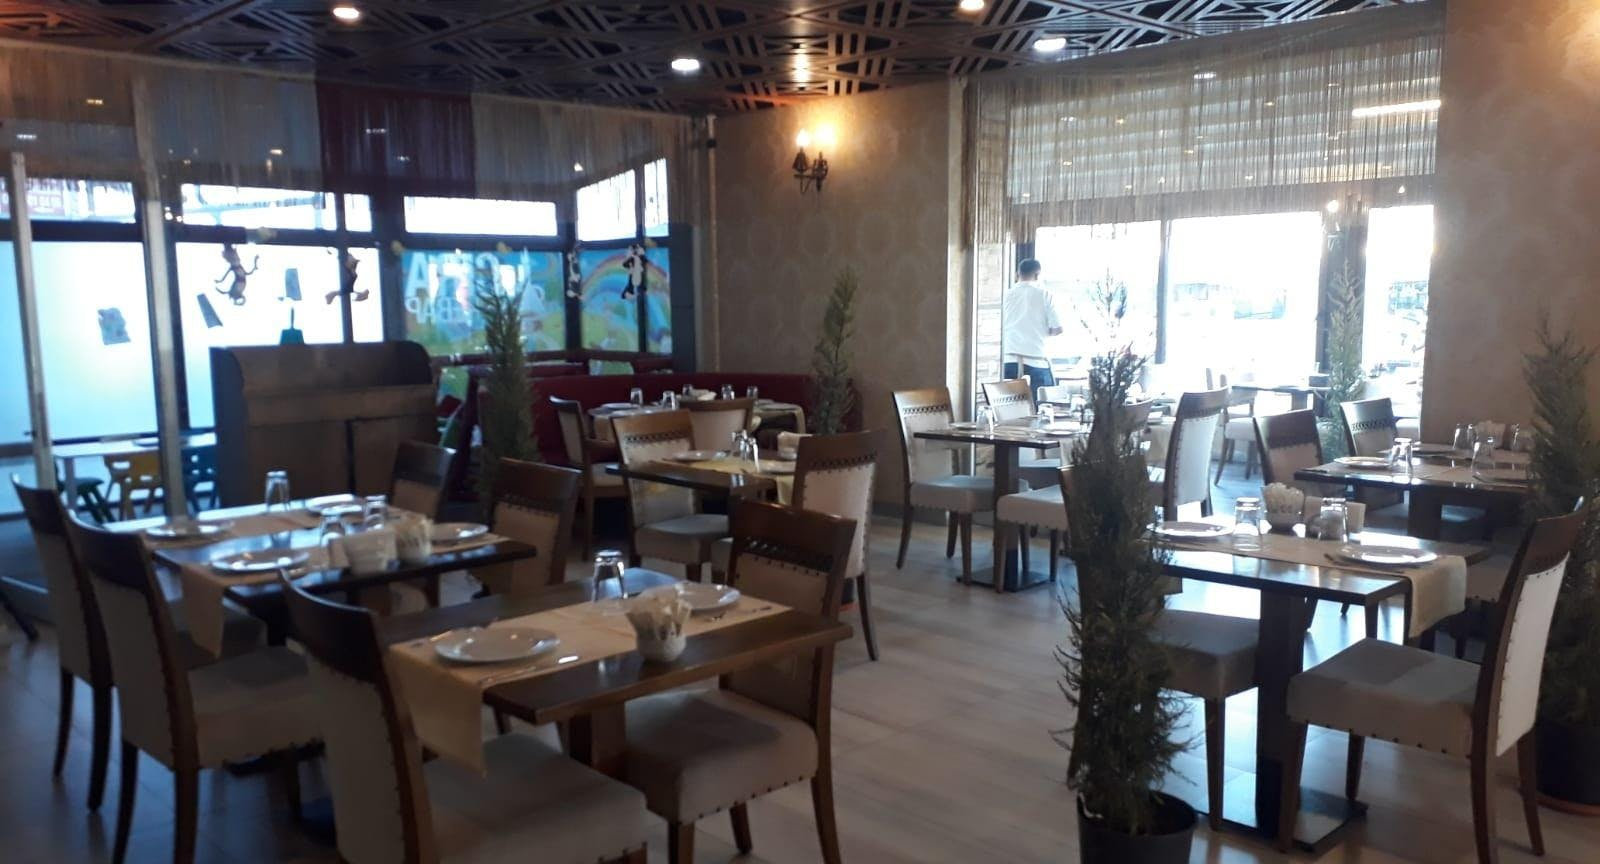 Photo of restaurant Çıra Kebap in Bahçeşehir, Istanbul